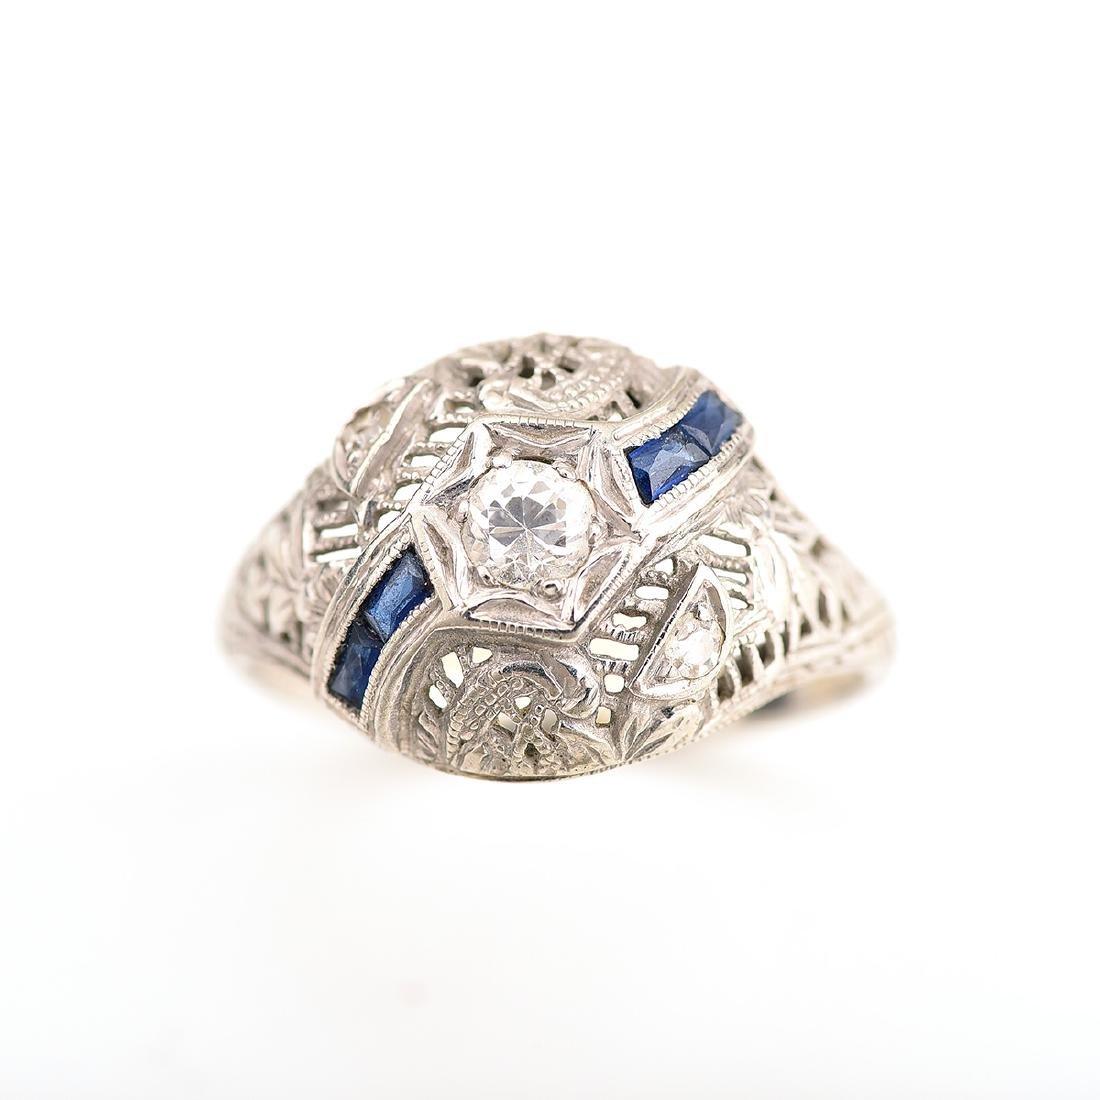 Vintage Diamond, Sapphire, 18k White Gold Ring. - 2